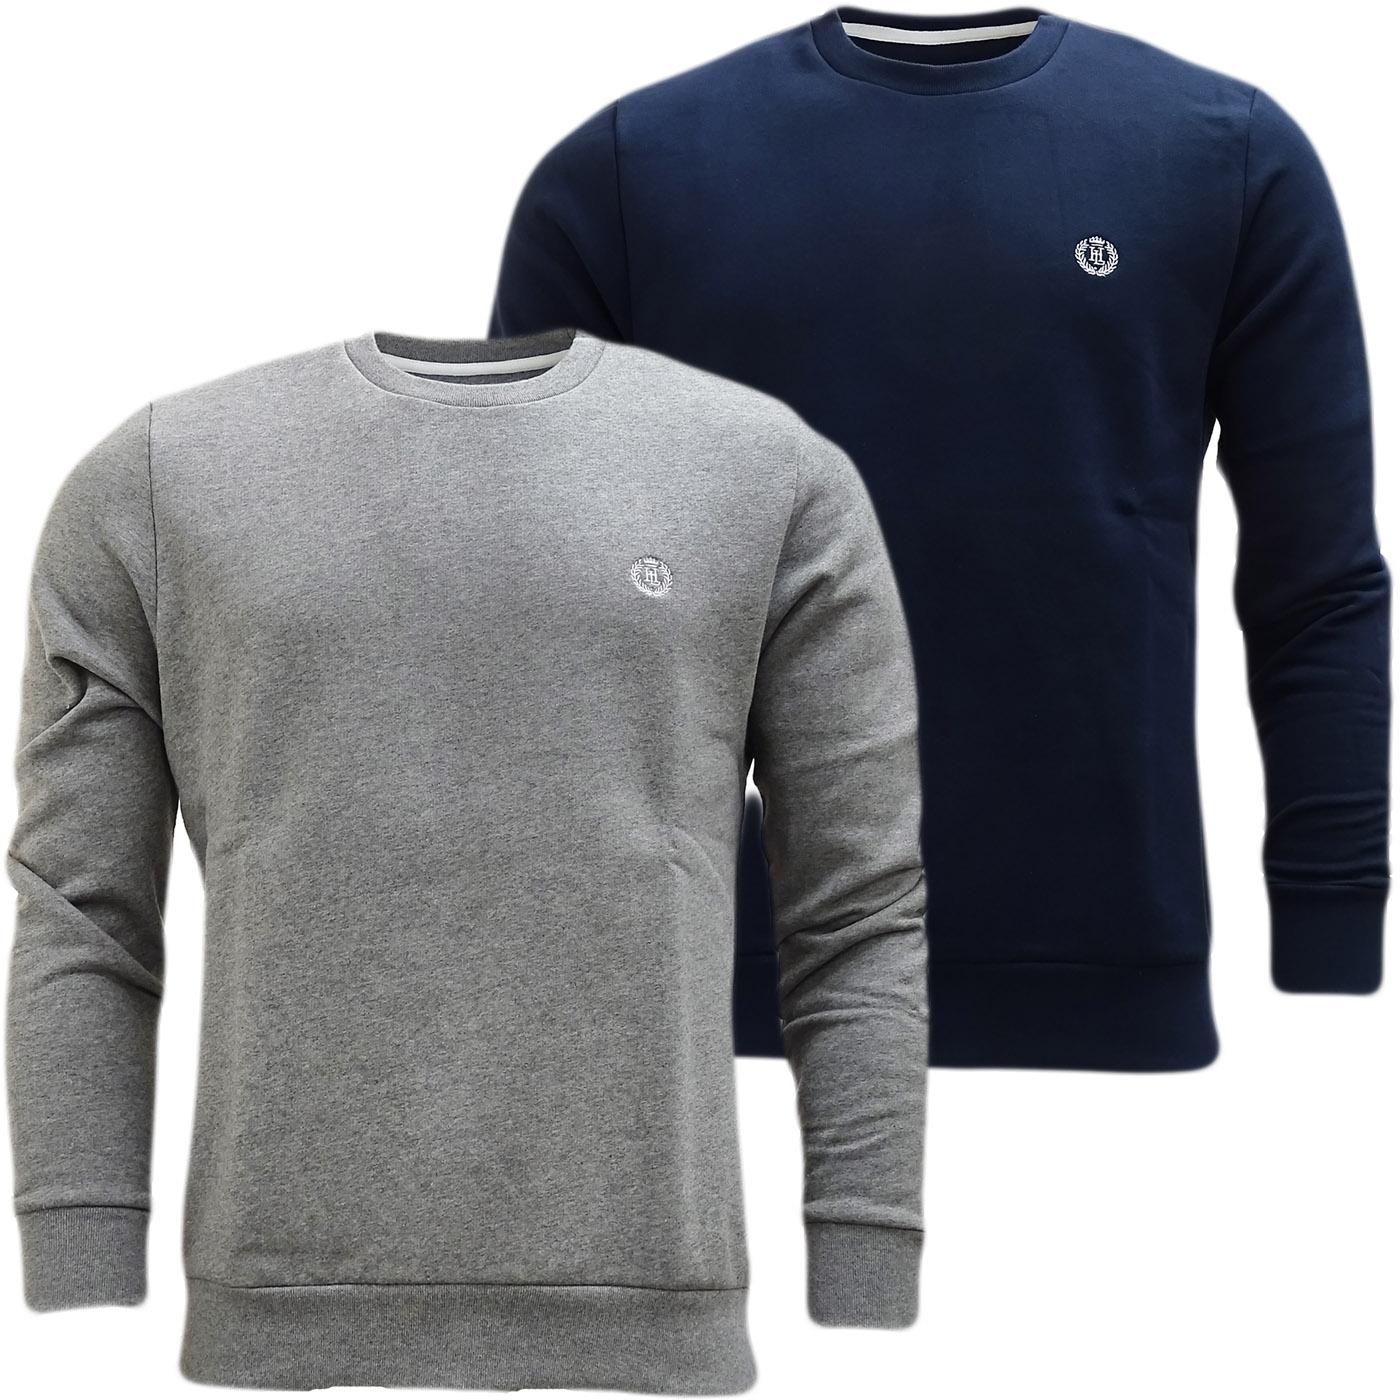 Henri Lloyd Plain Sweatshirt - Soft Cotton Jumper Bredgar